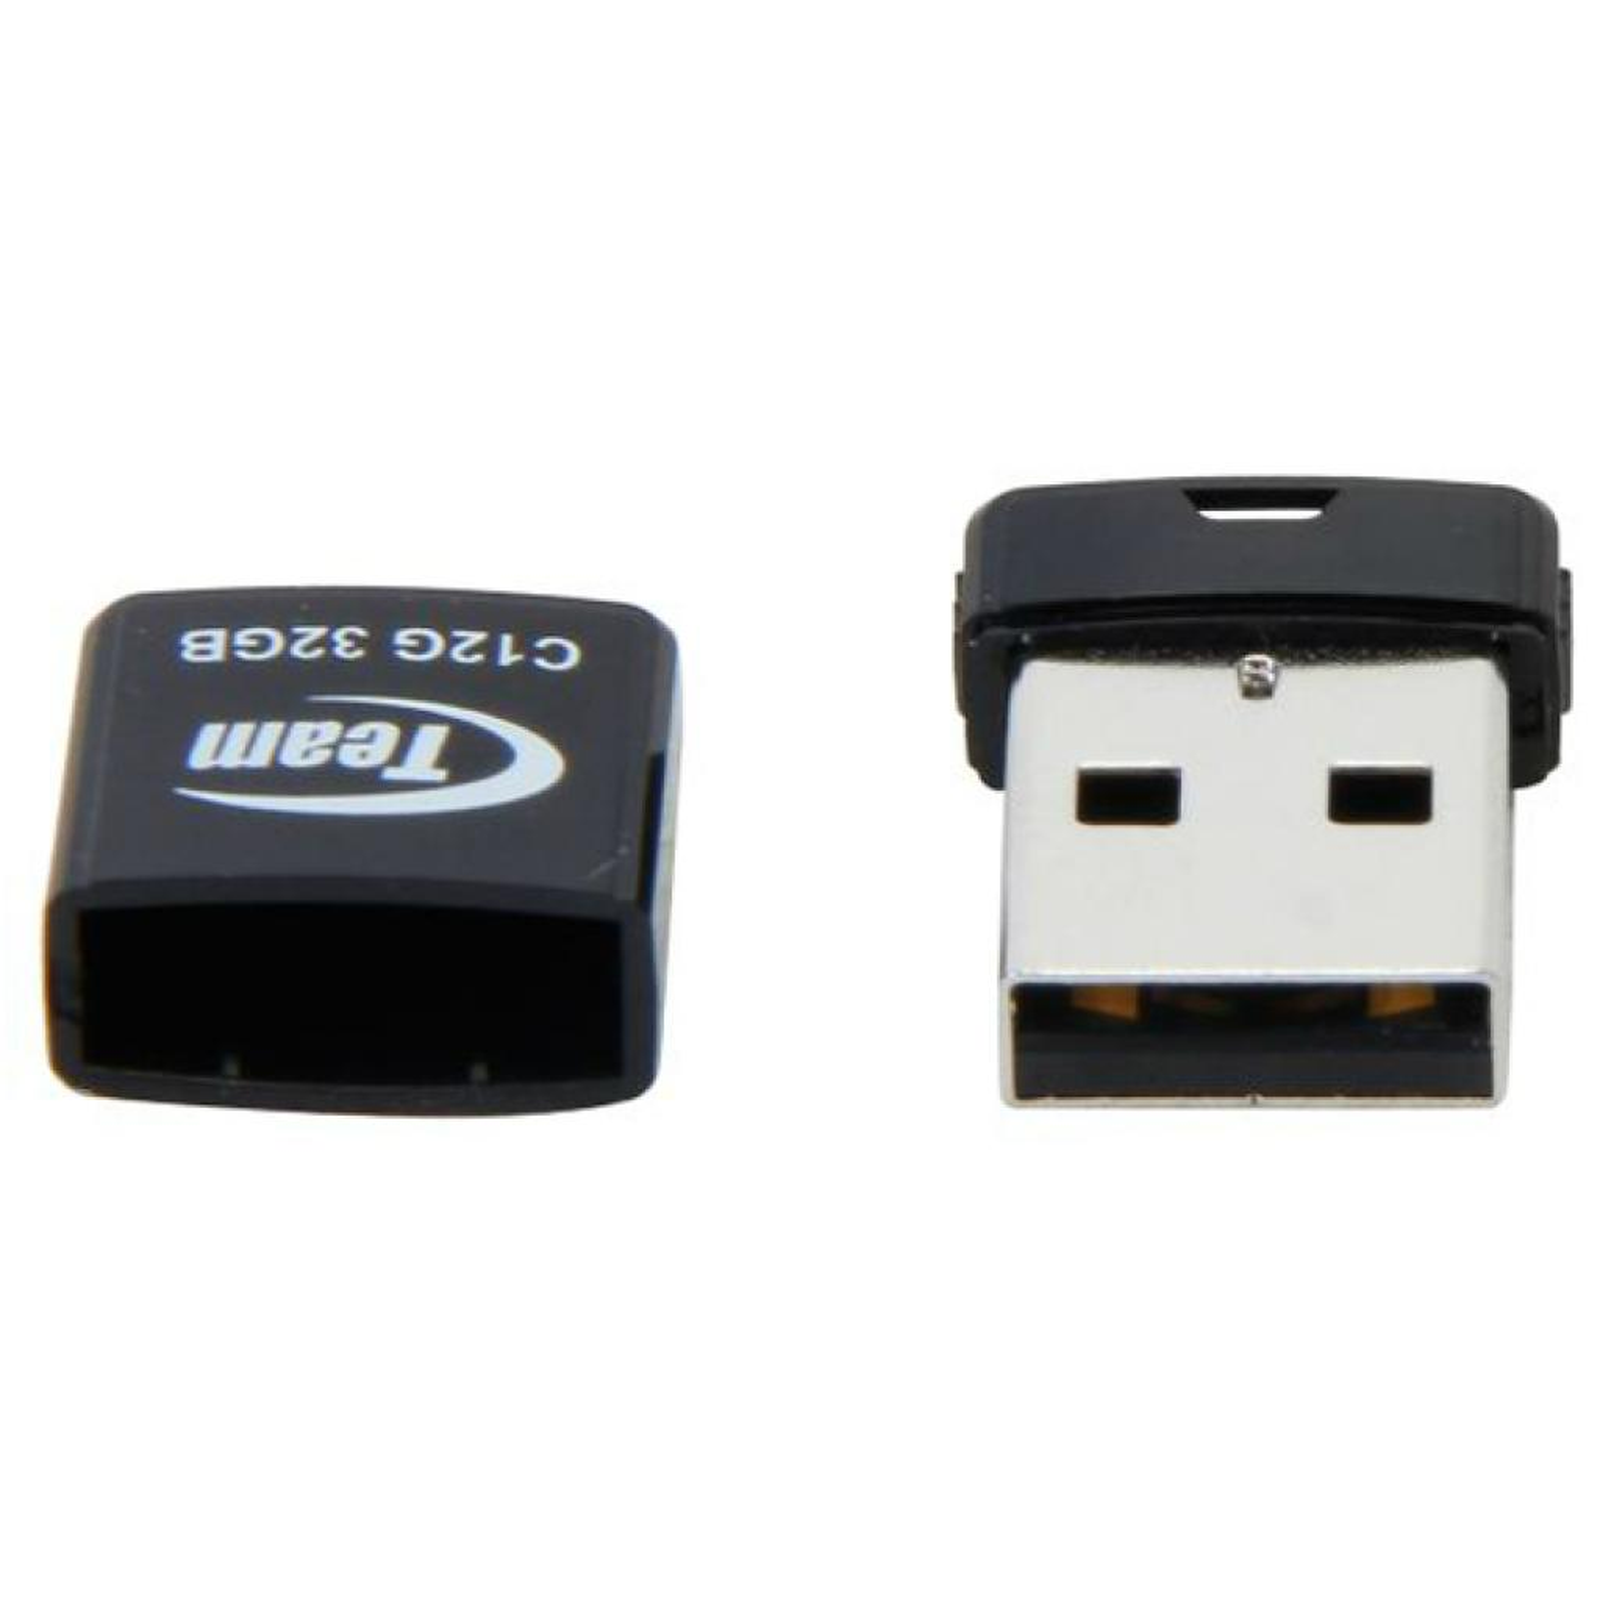 USB флеш накопитель Team 32GB C12G Black USB 2.0 (TC12G32GB01) изображение 4